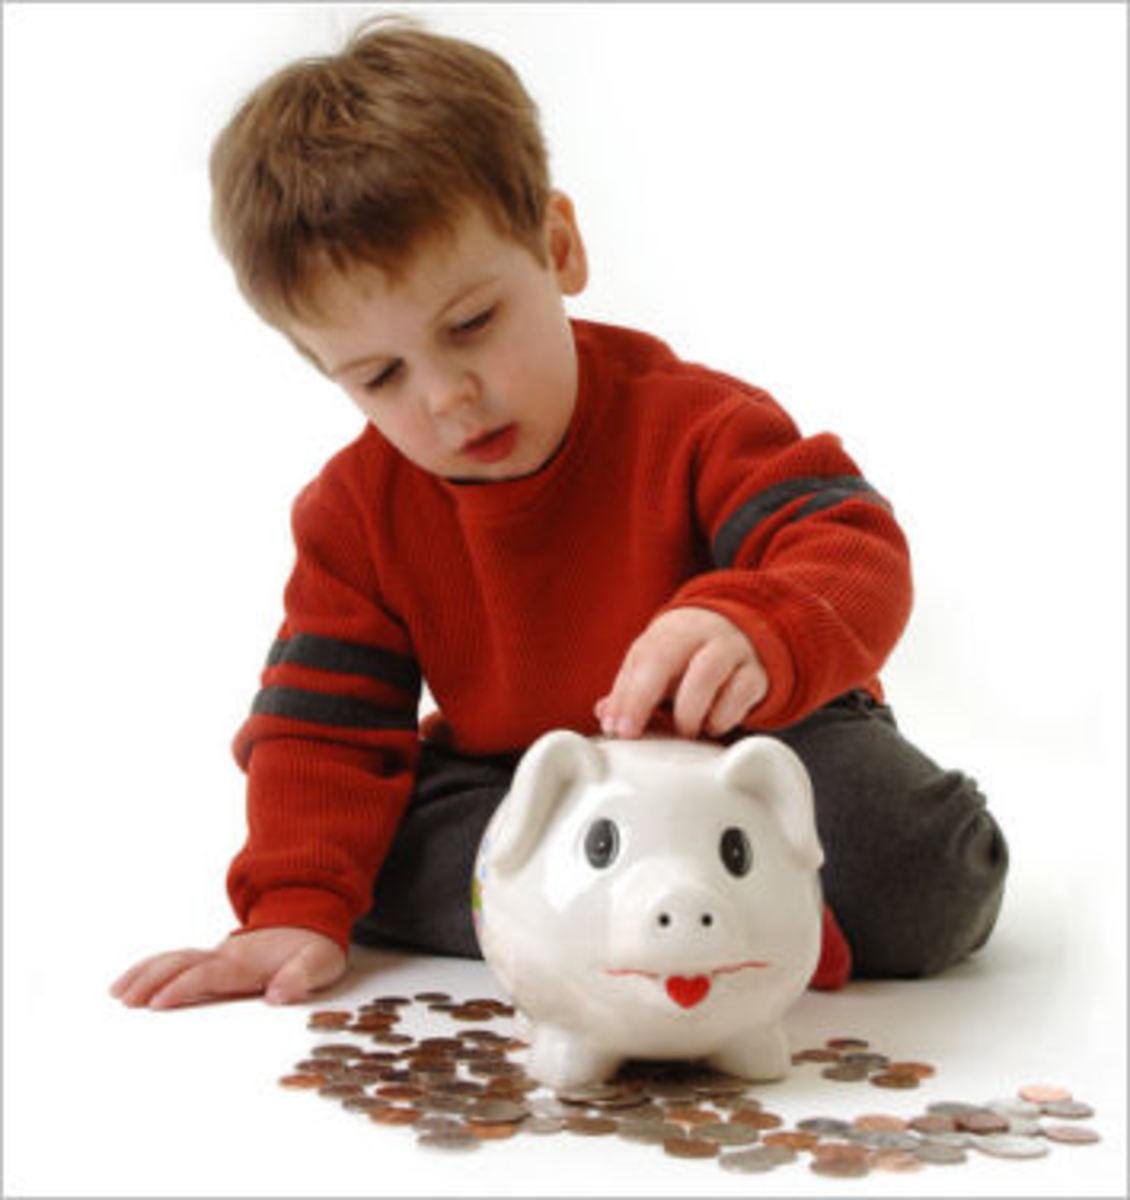 Teaching Kids to Manage Money